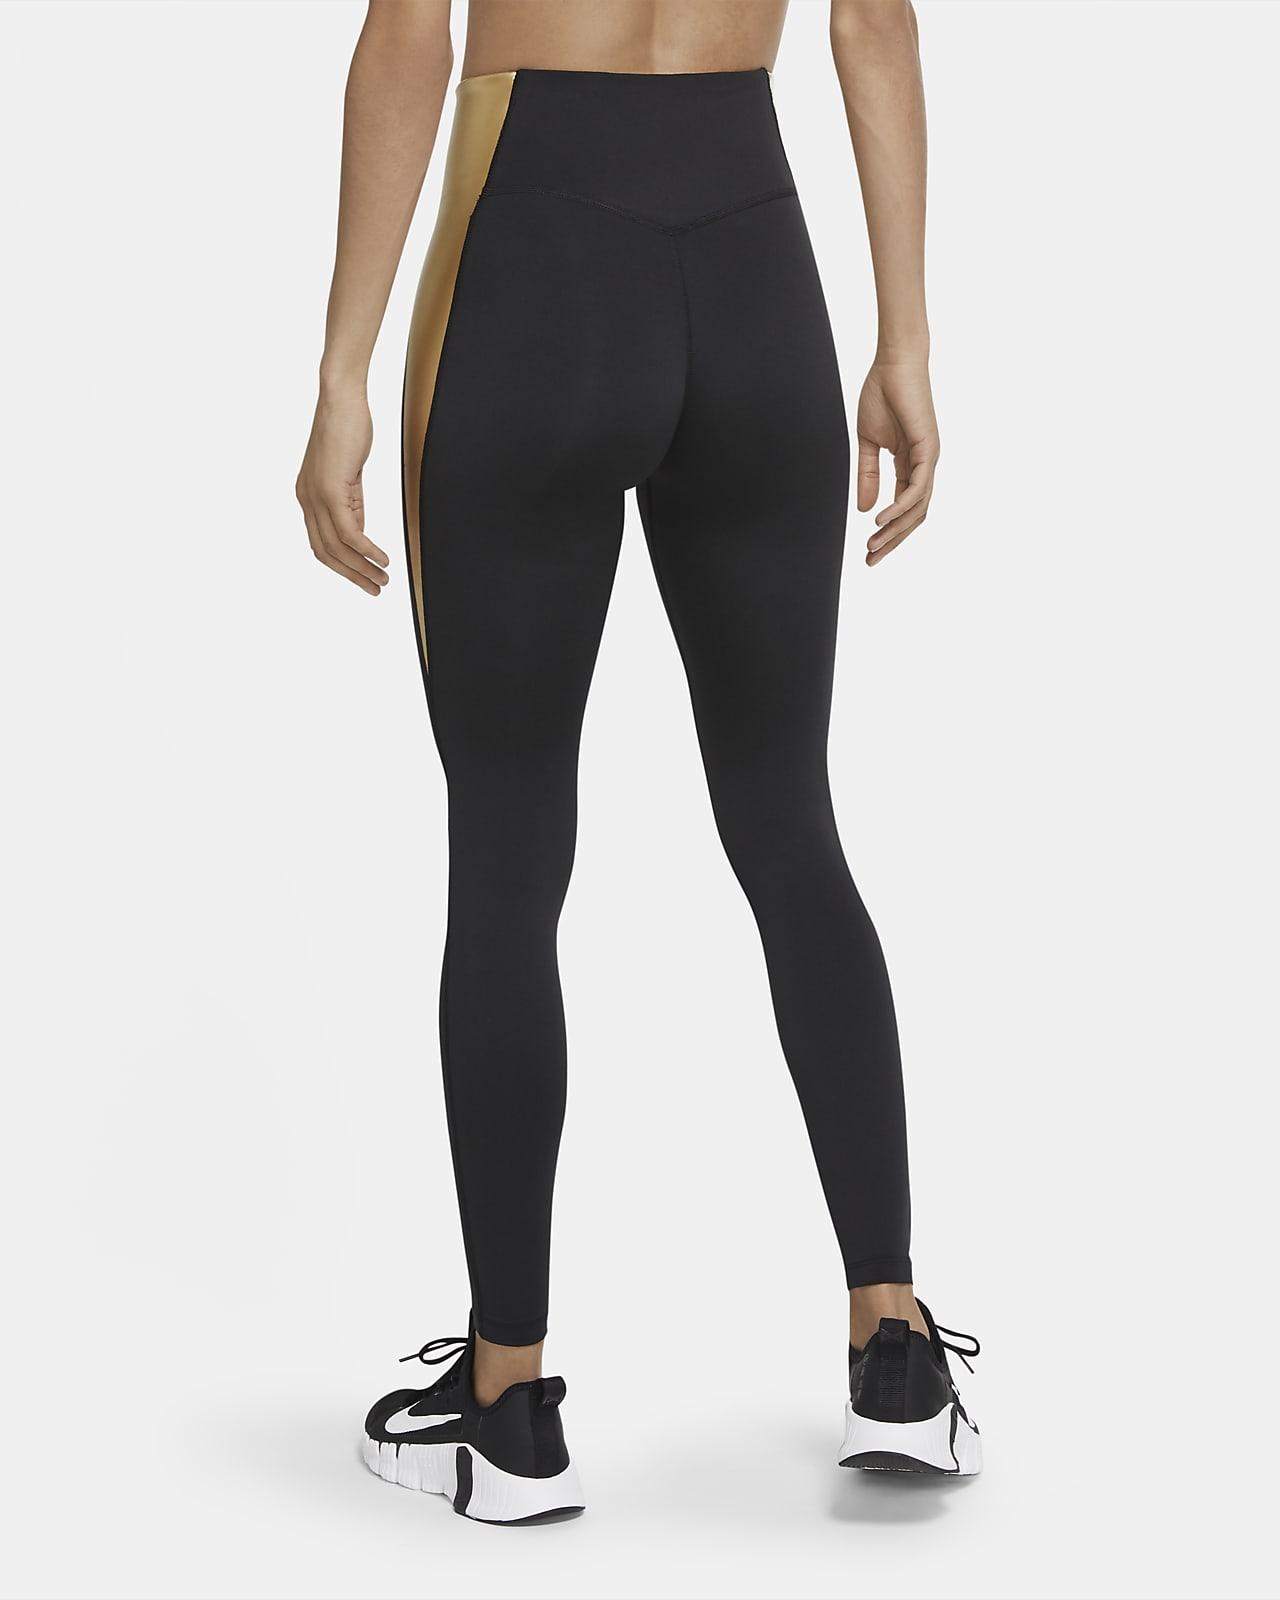 Nike One Women's Leggings. Nike GB